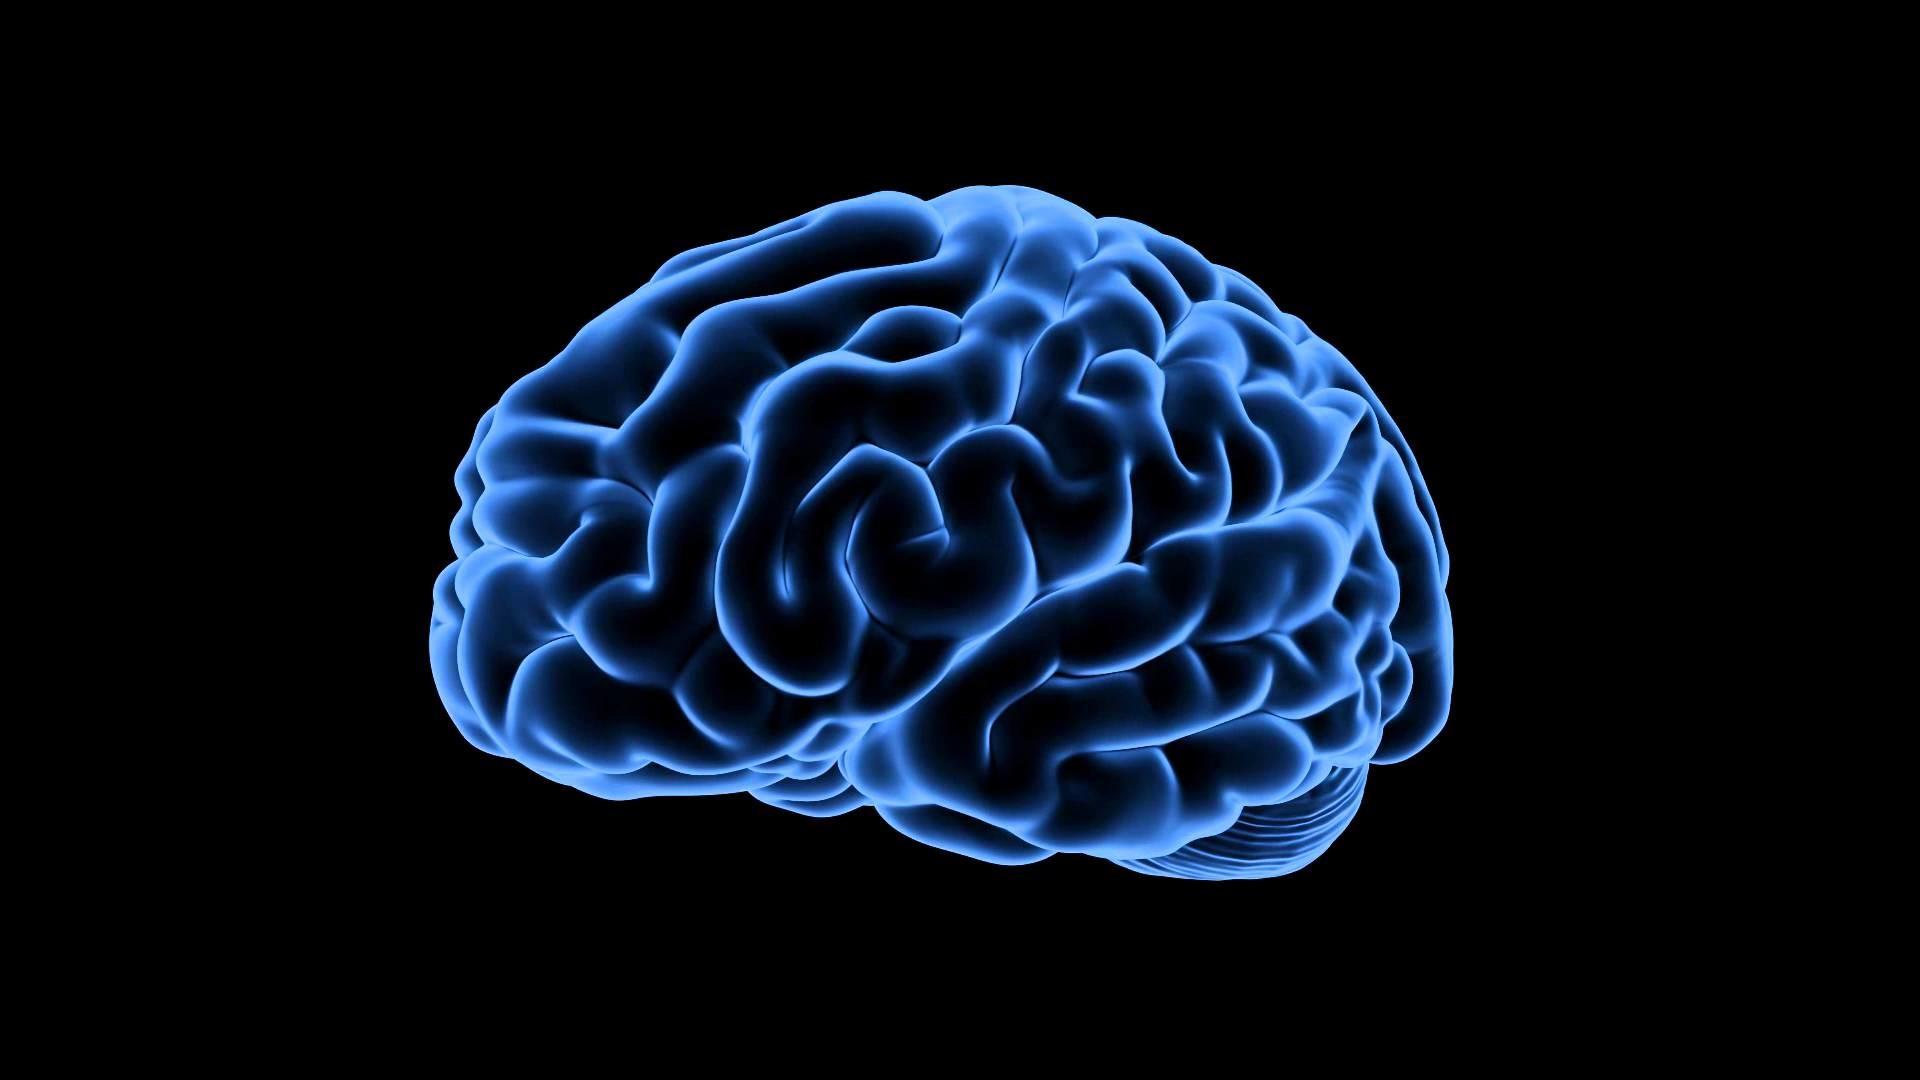 Royalty Free Medical Human Brain HD Footage – Brain ( Blue)360 Degree View  – YouTube